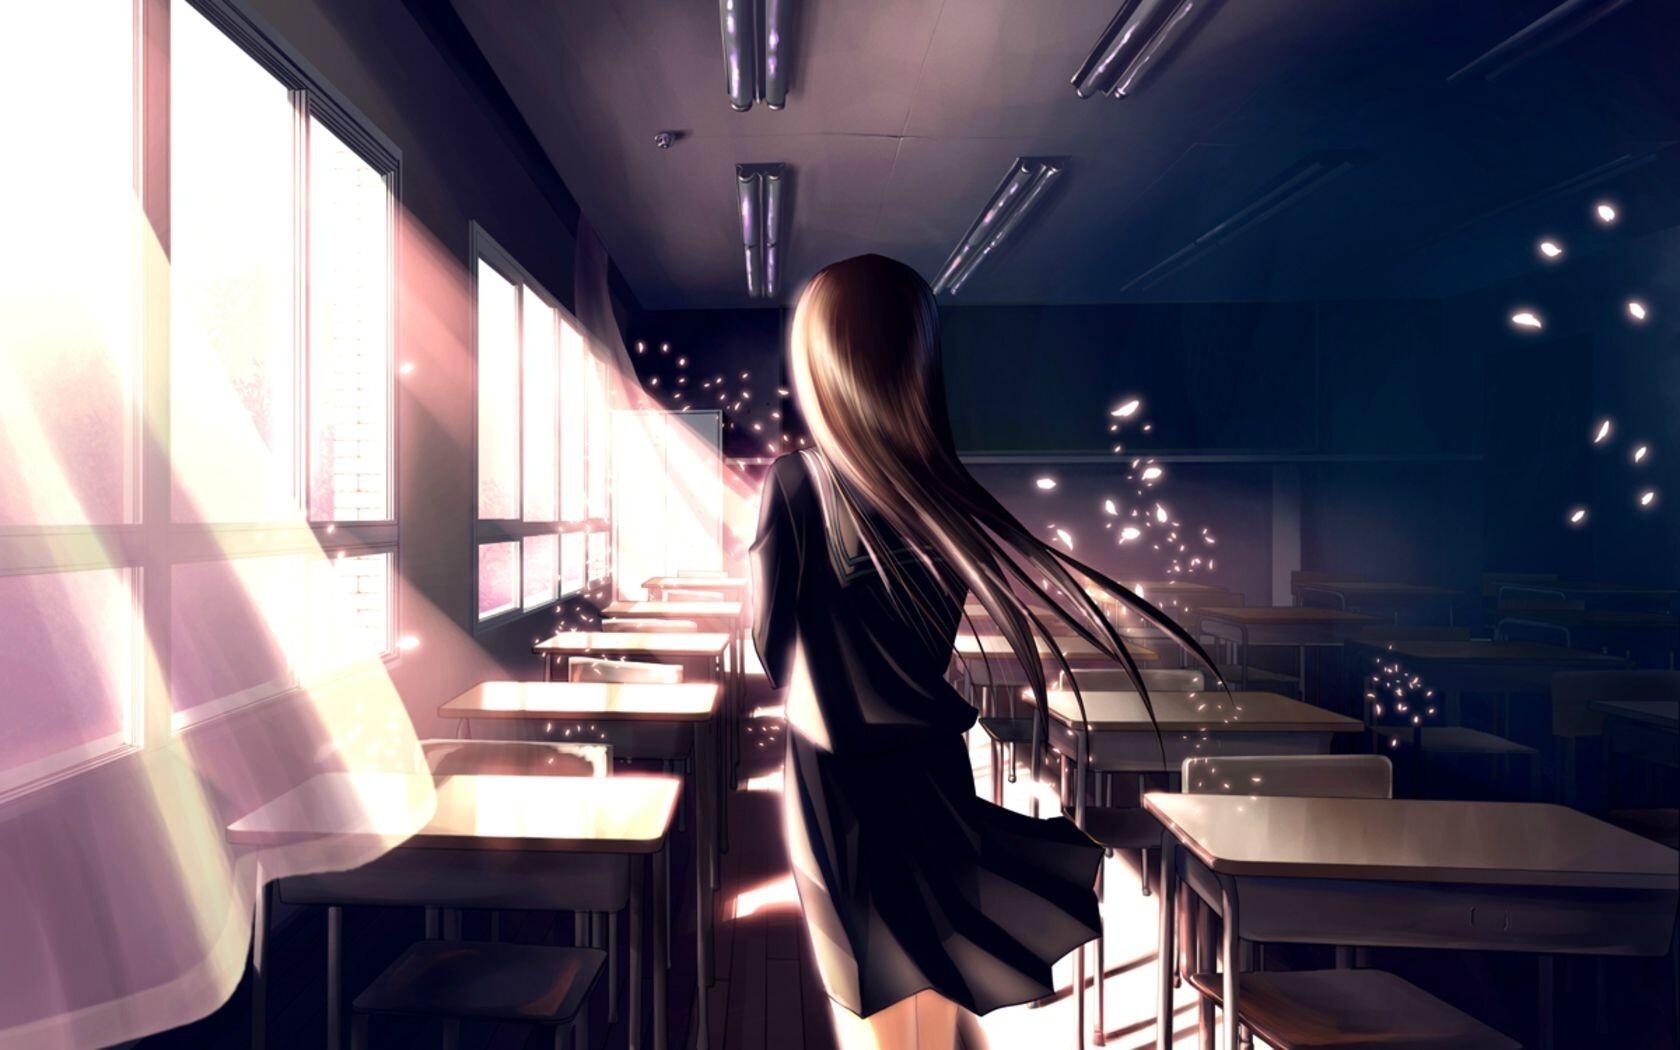 1680x1050 Anime School Girl Resolution HD 4k Wallpapers